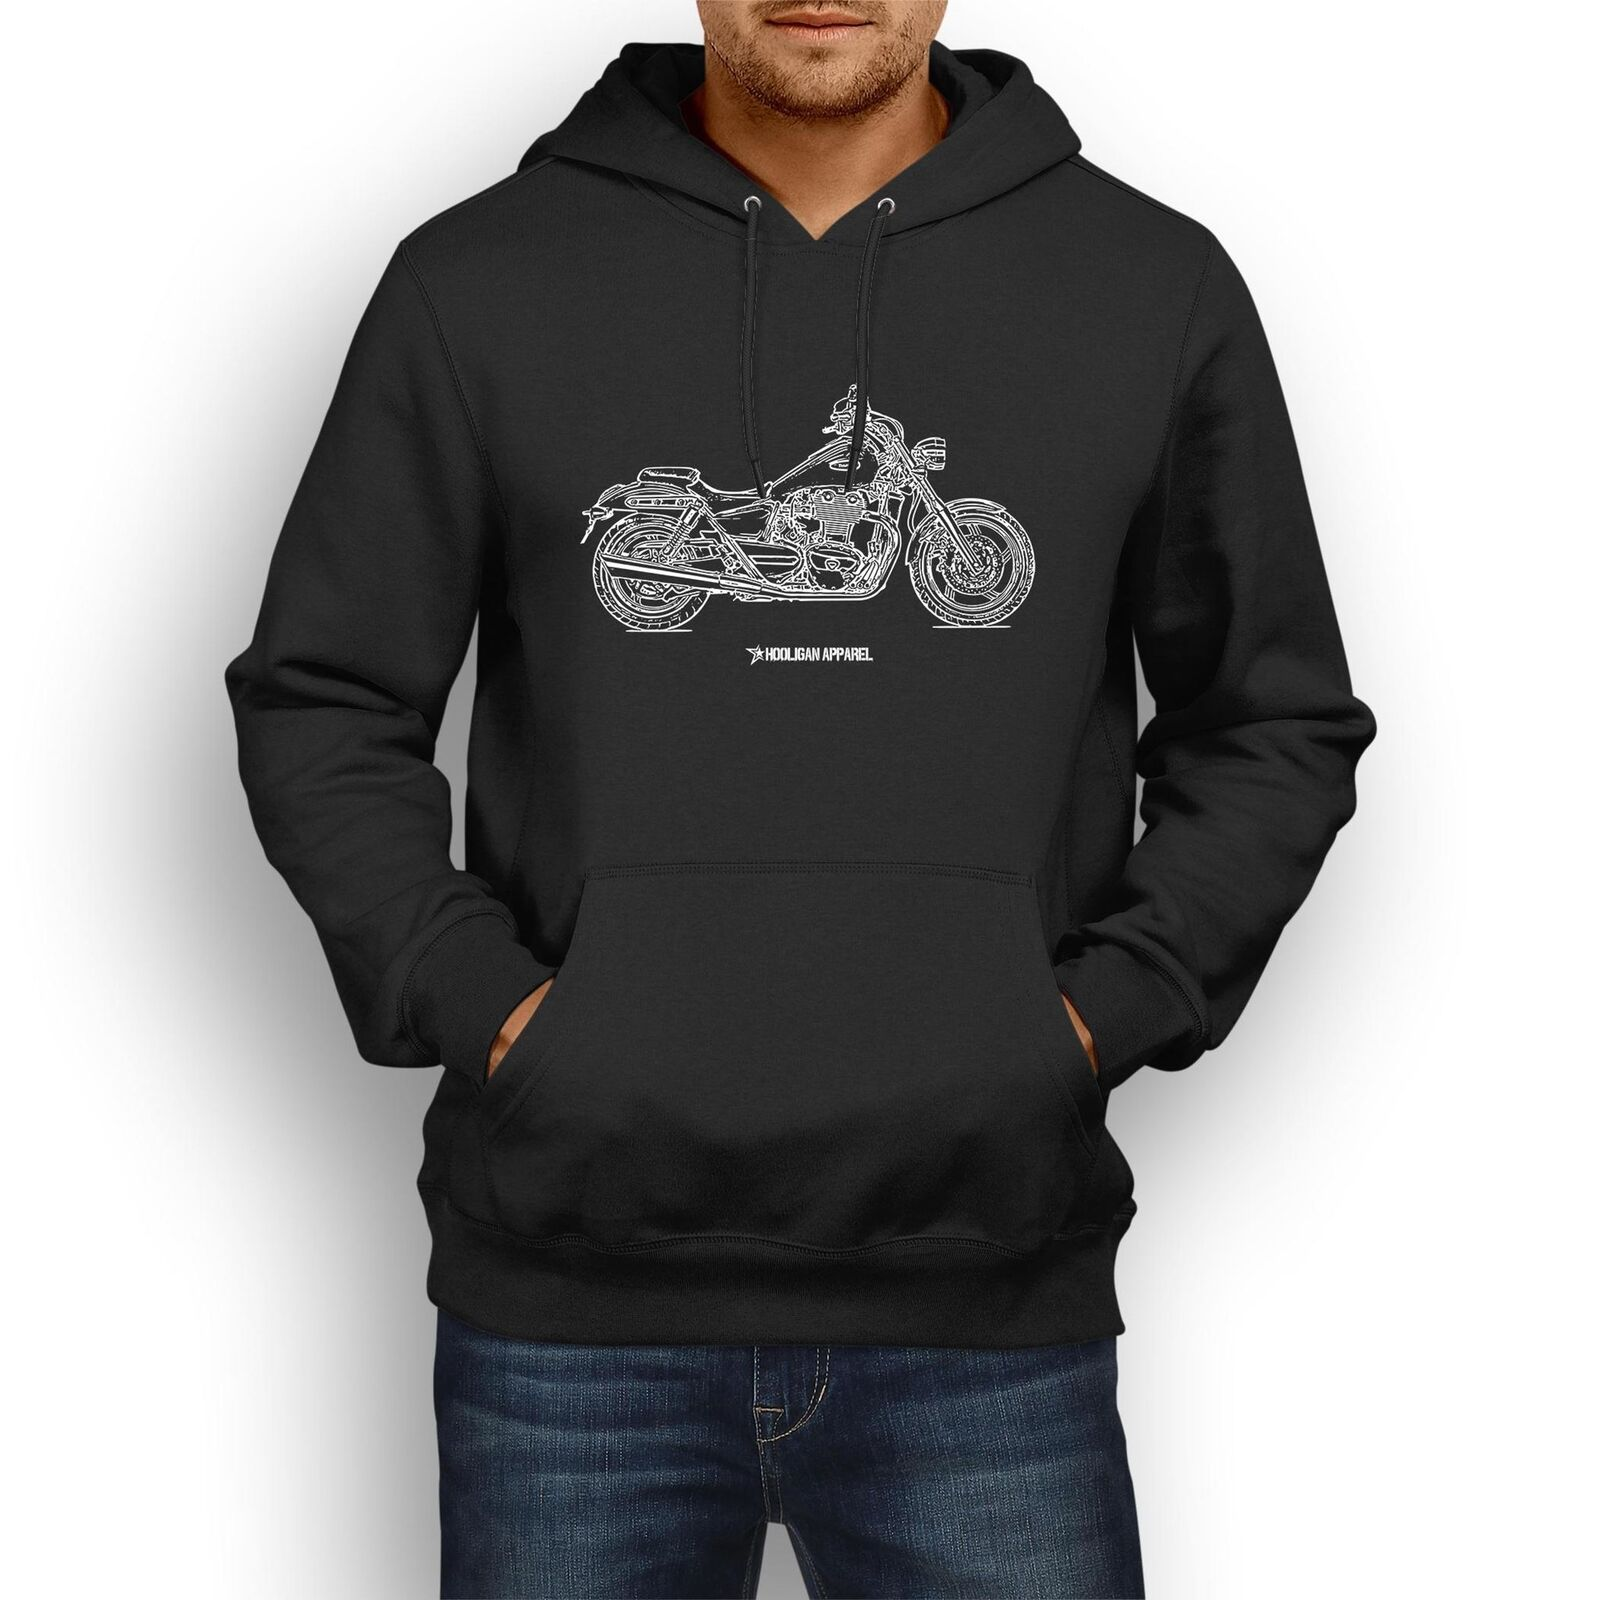 Triumph Thunderbird 2016 InspiROT Motorcycle Art Men's Hoodie